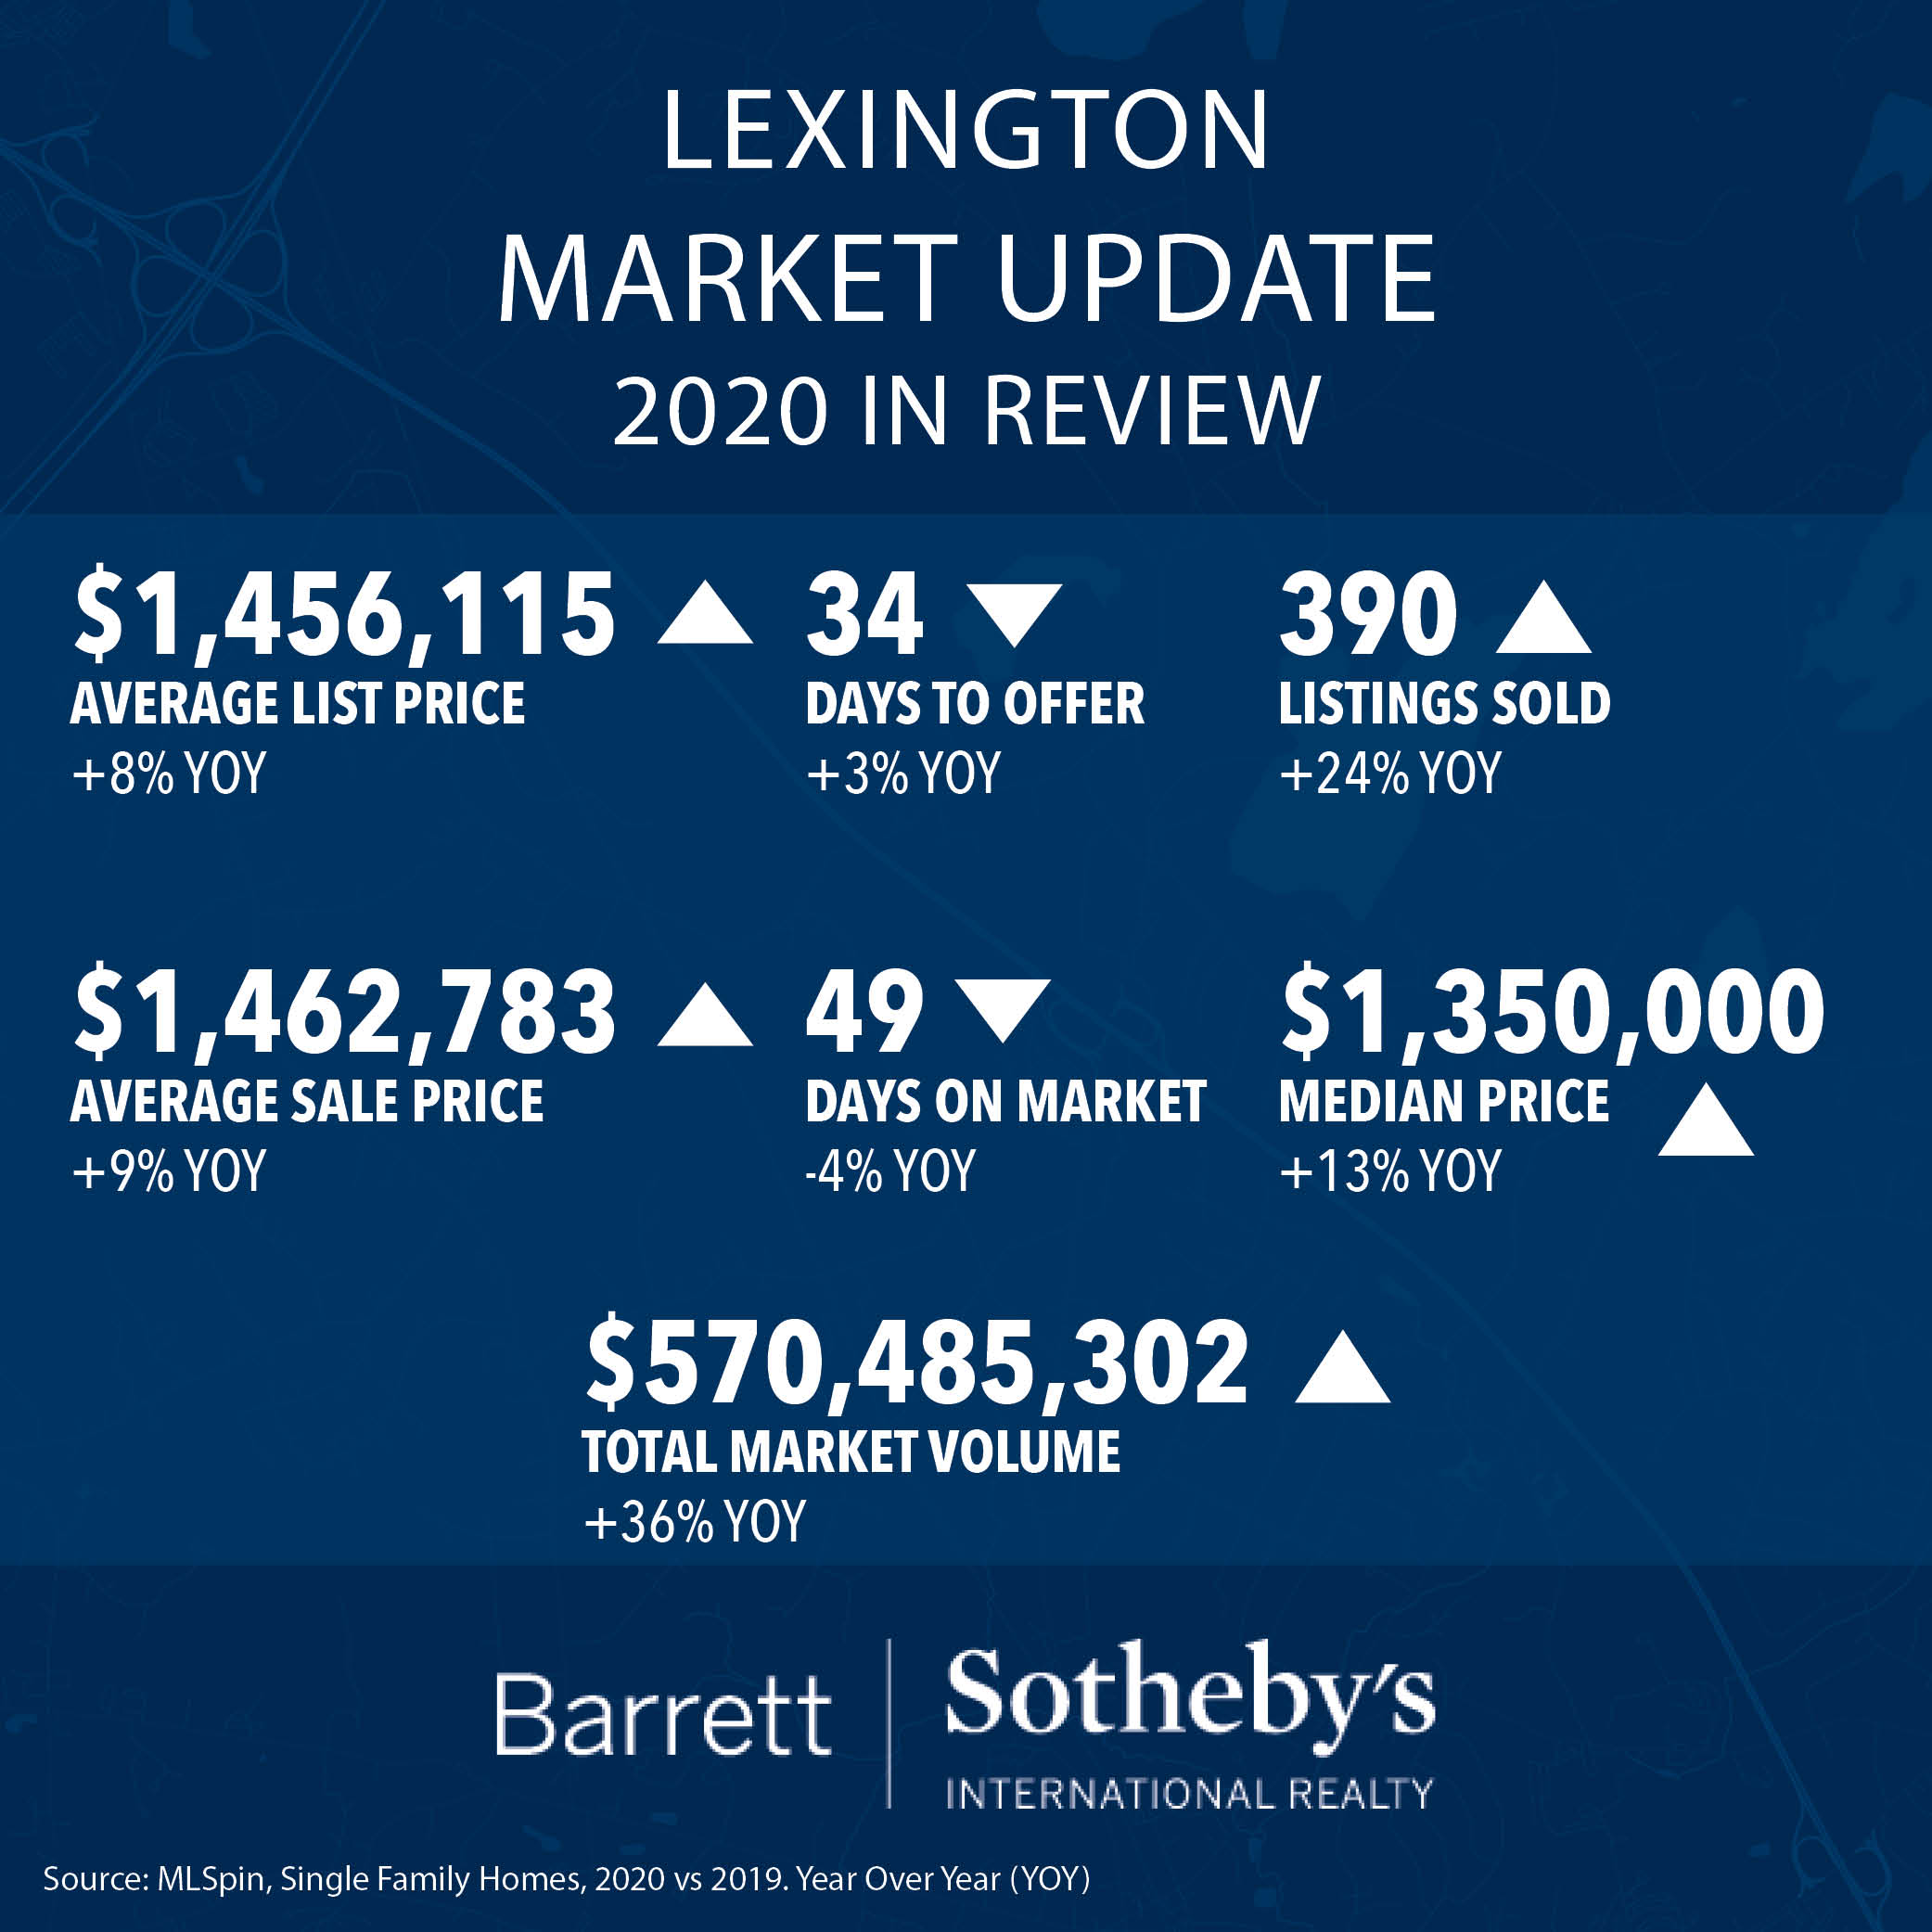 Lexington Market Update: 2020 in Review